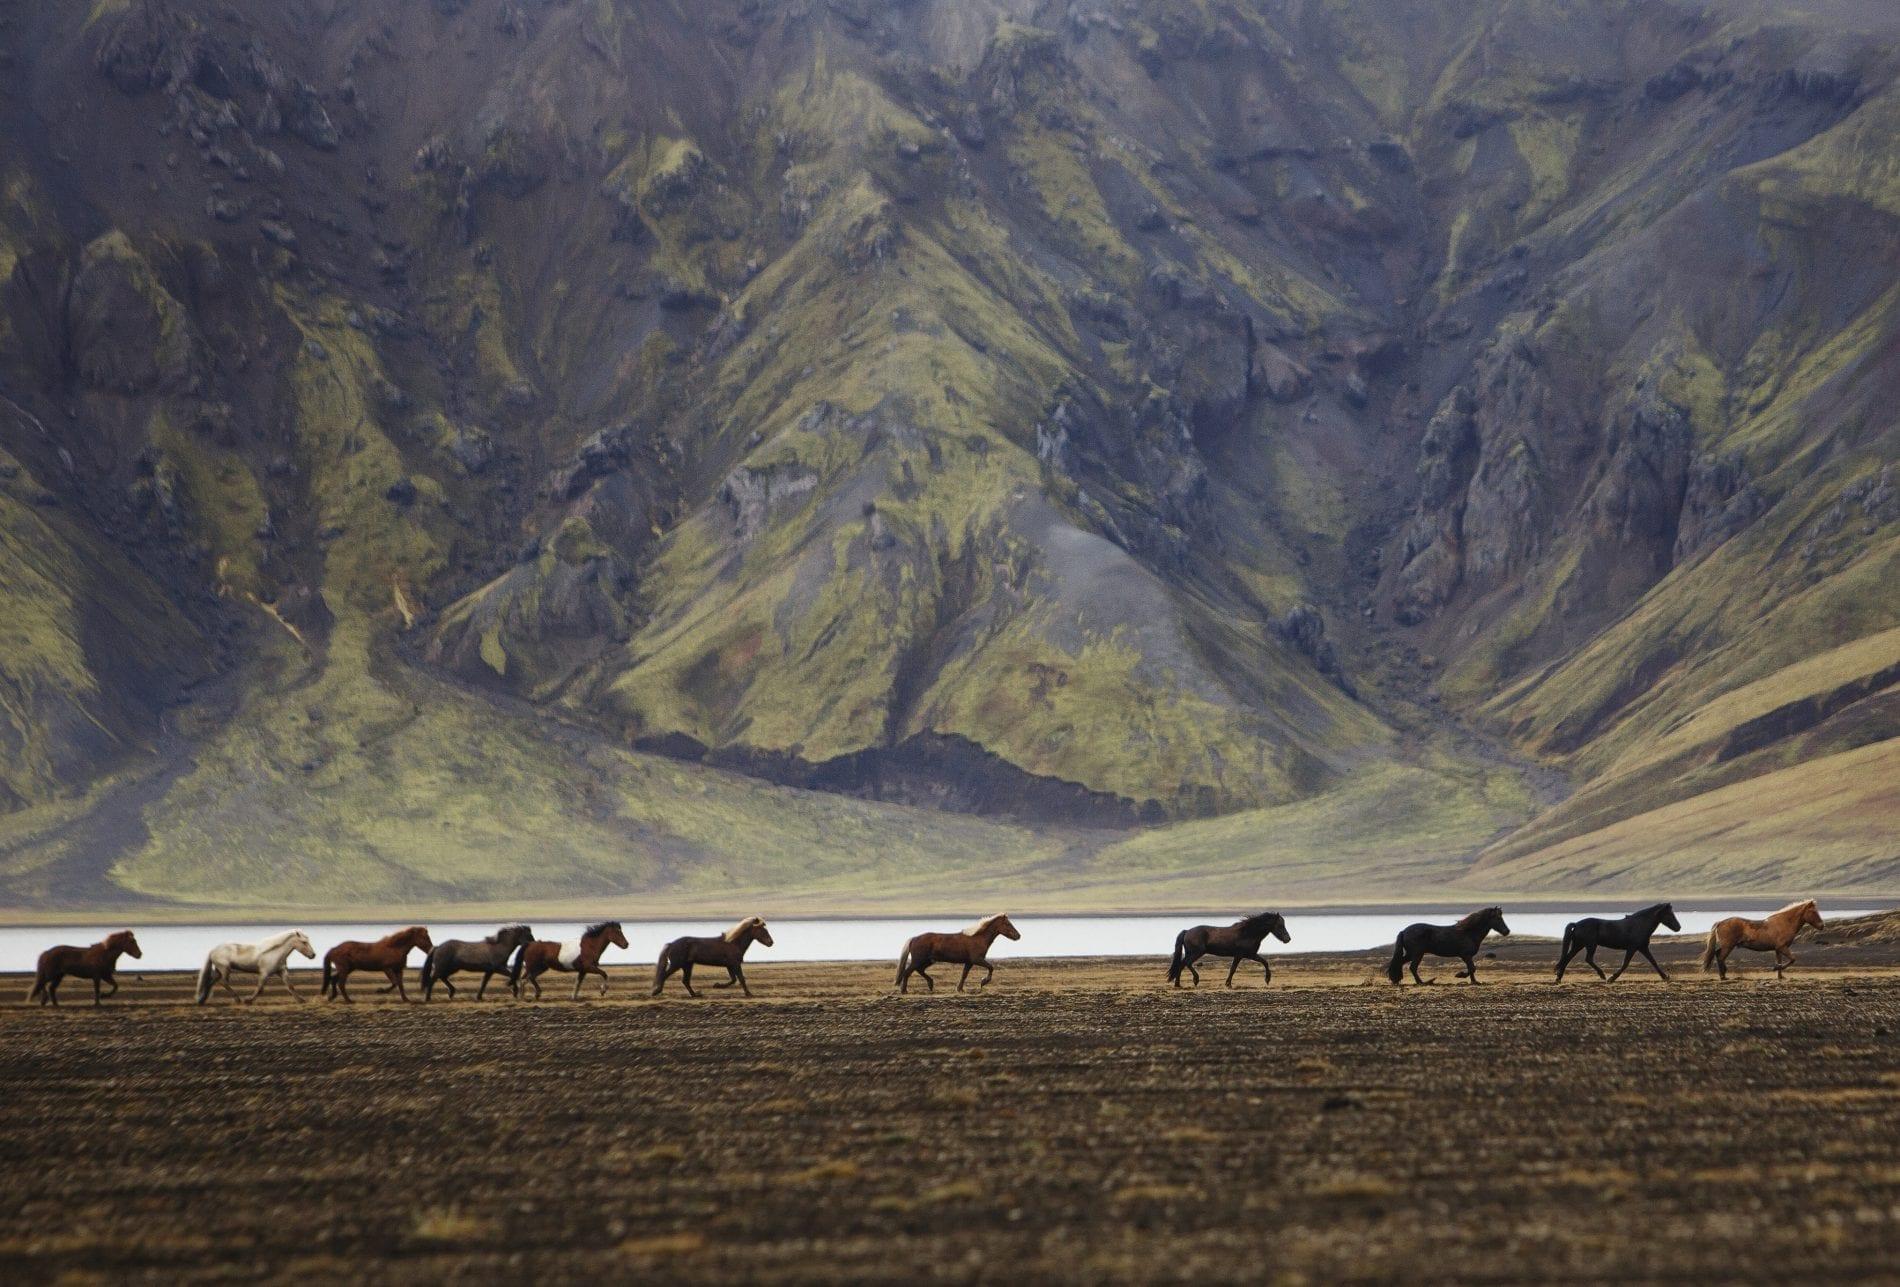 Thirteen horses in a row pass a lake on their left in stunning Landmannalaugar.